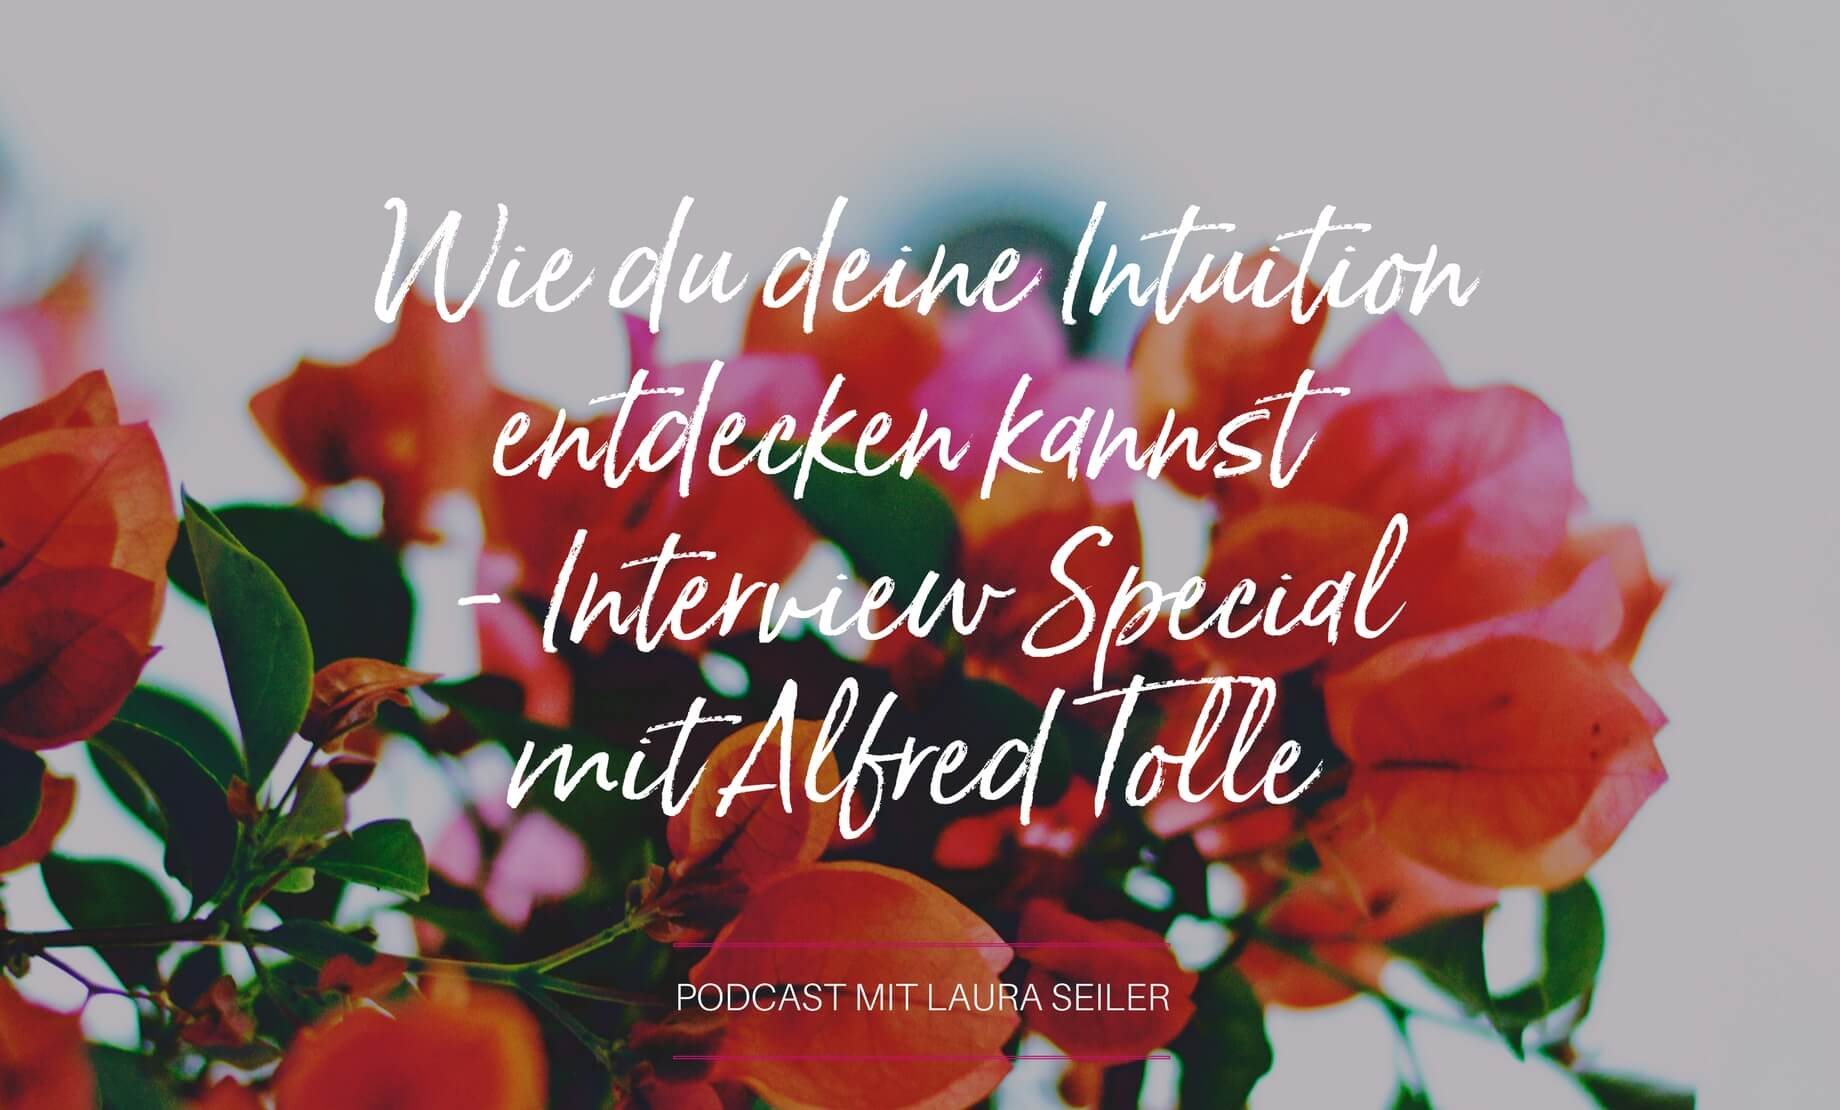 Intuition Laura Seiler Podcast